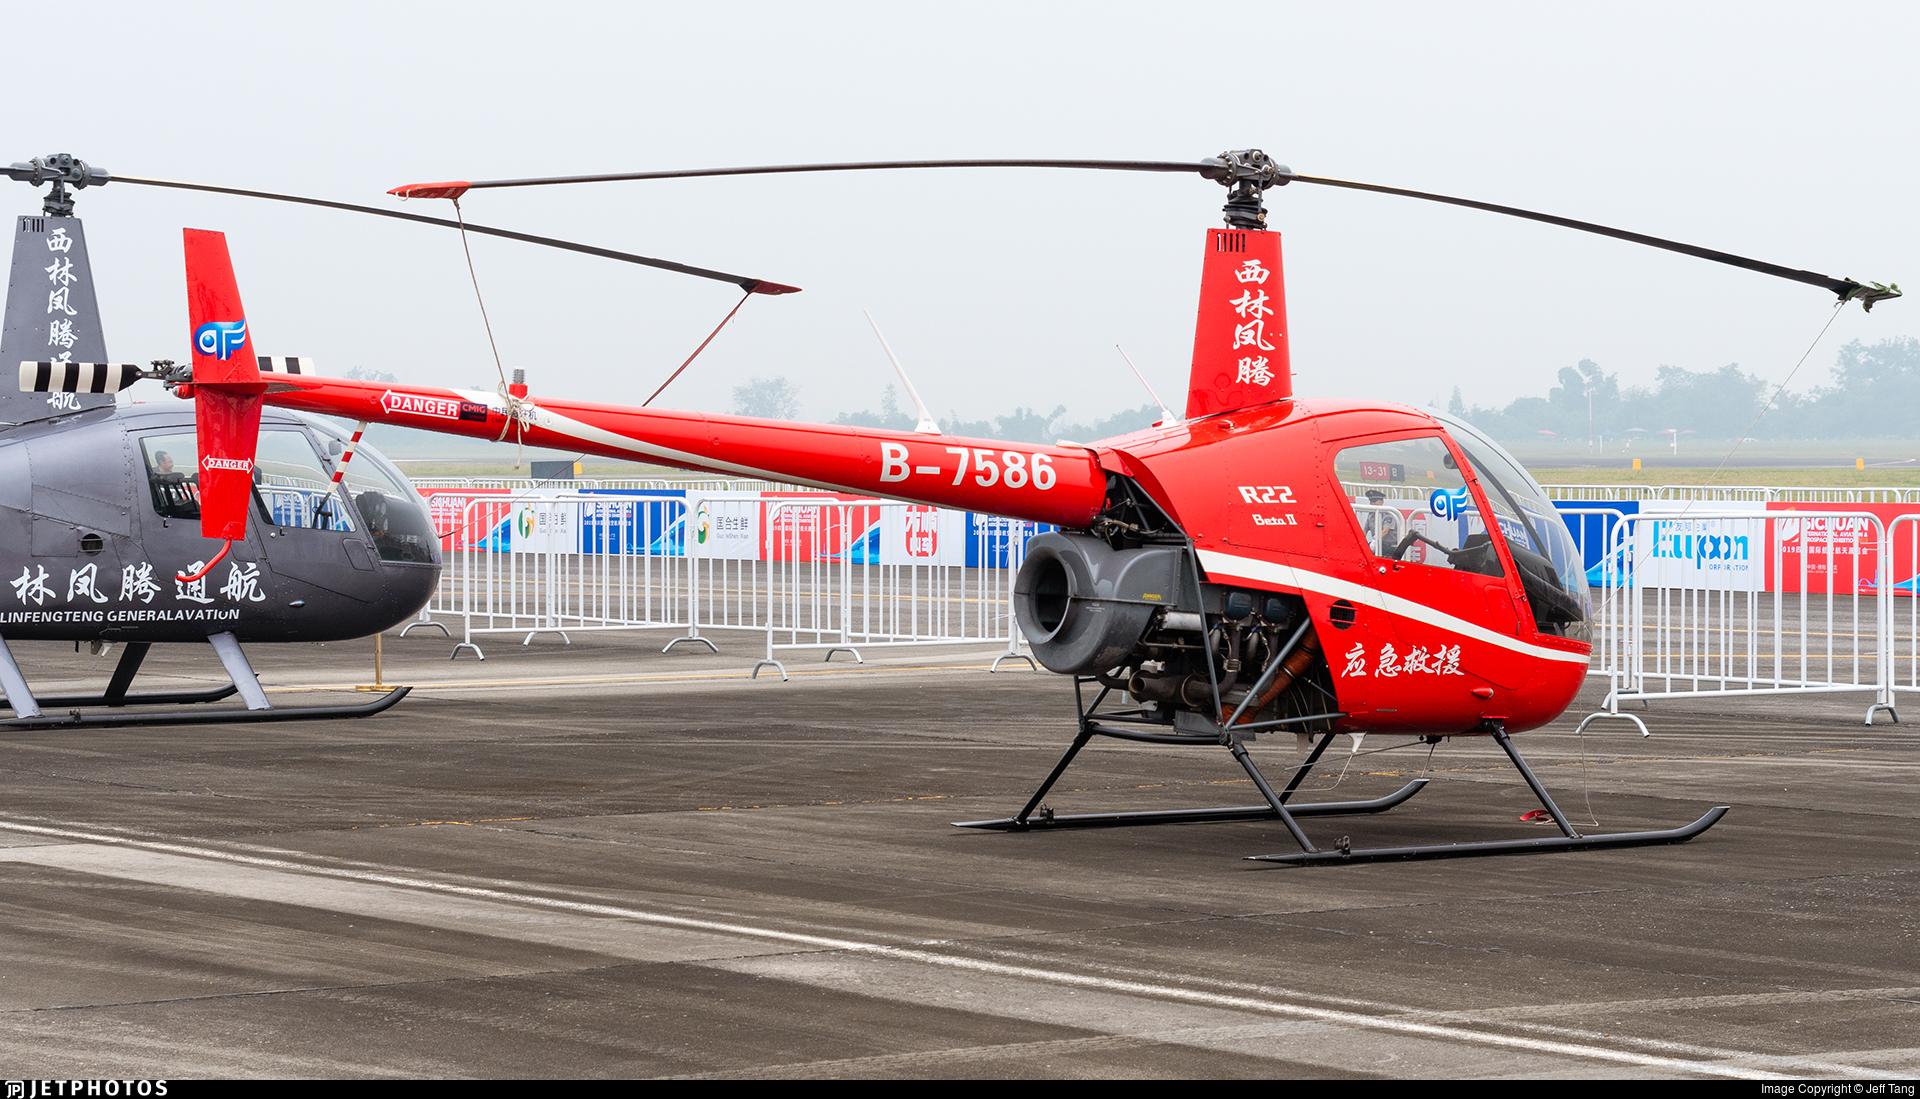 B-7586 - Robinson R22 Beta II - Sichuan Xiling Fengteng General Aviation